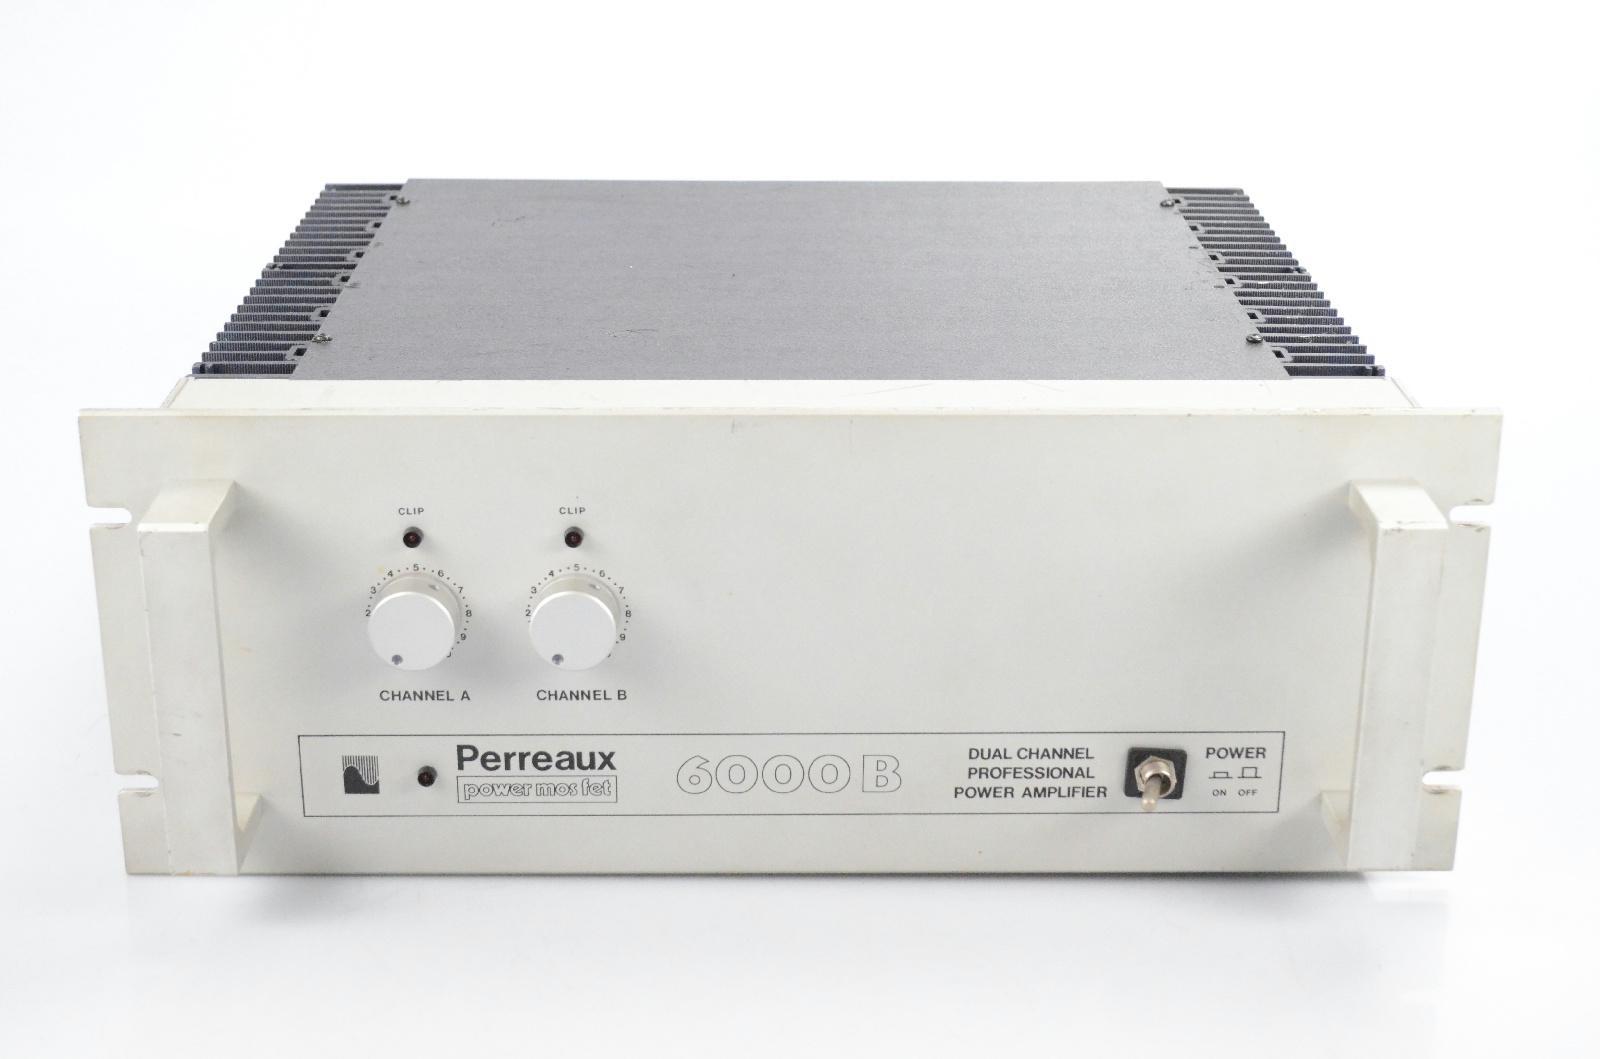 Perreaux 6000B Power MosFet 2 Channel Stereo Power Amplifier Amp 6000 B #31702